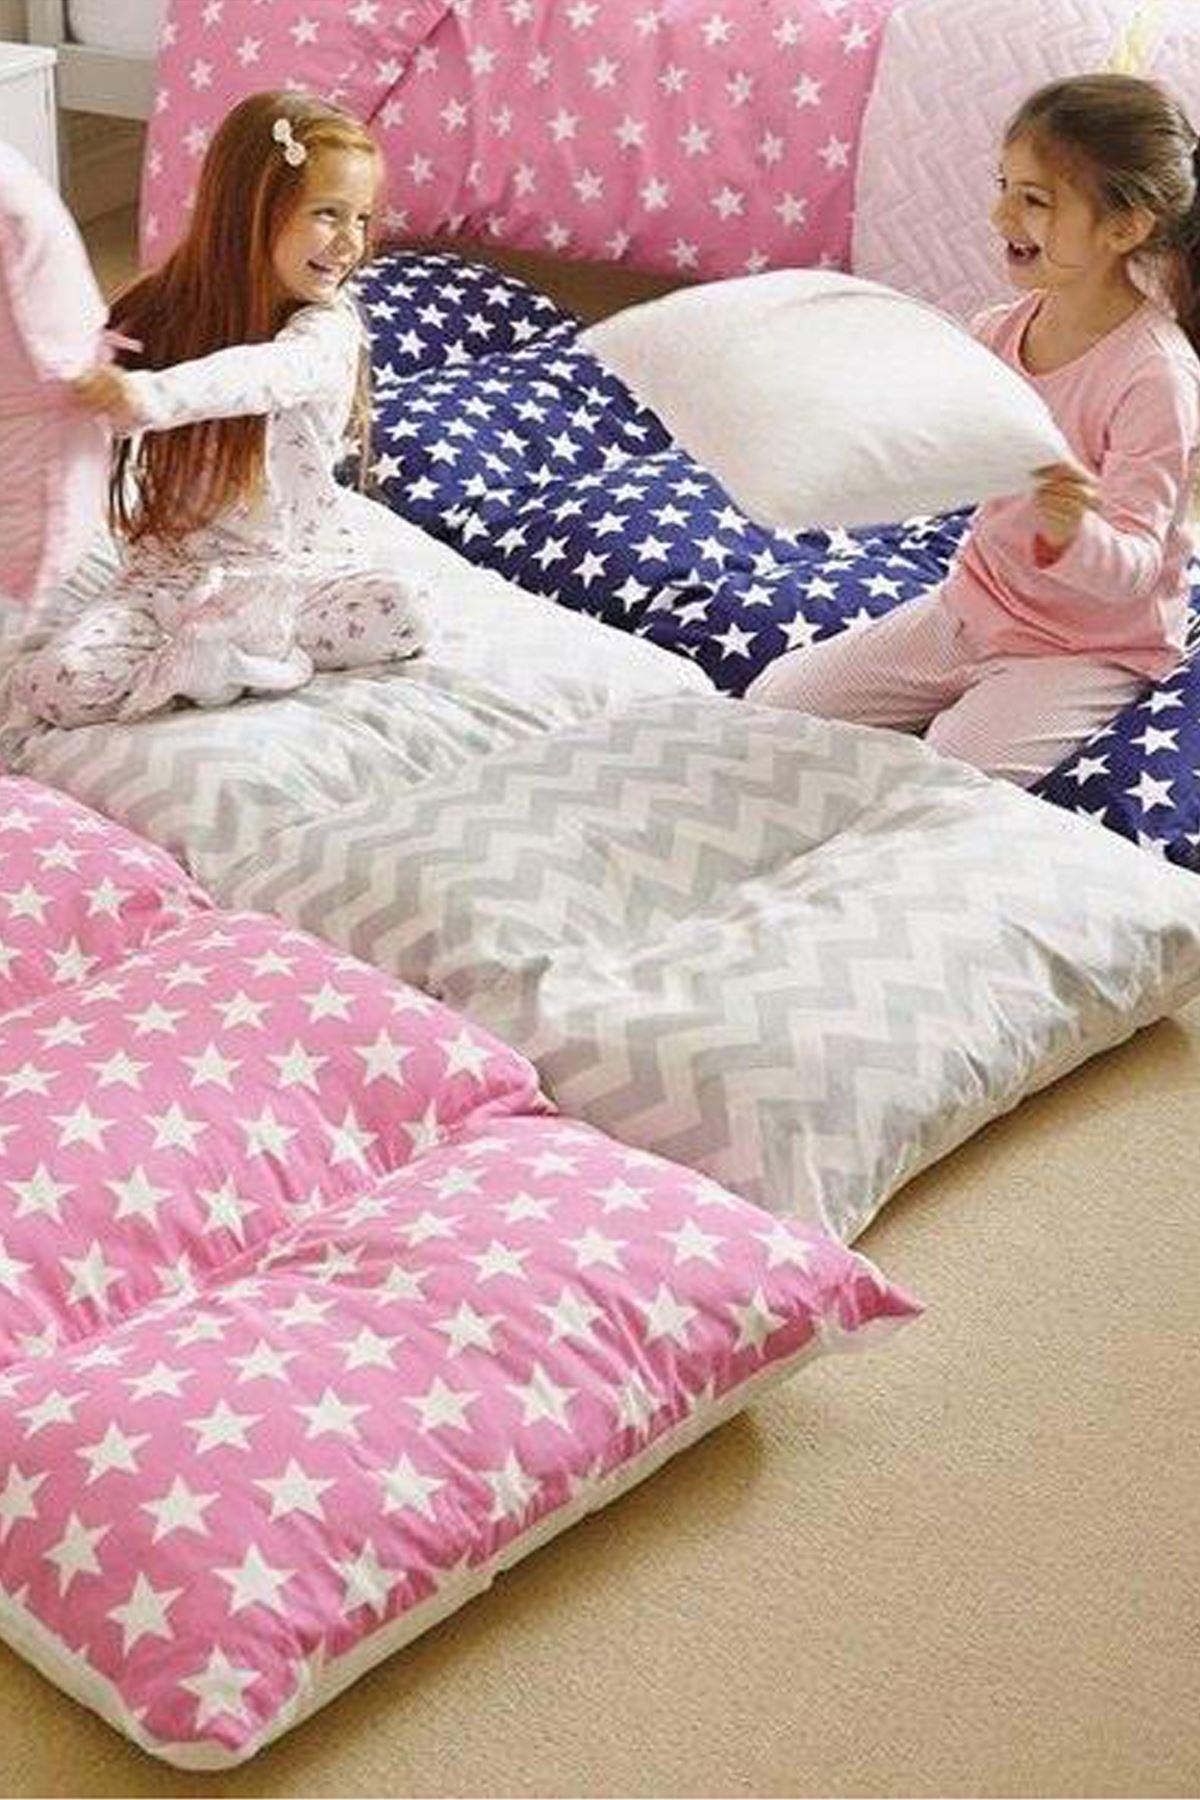 Gray Bundera Pouf Foldable Floor Cushion Pillow Kids Baby Floor Bed